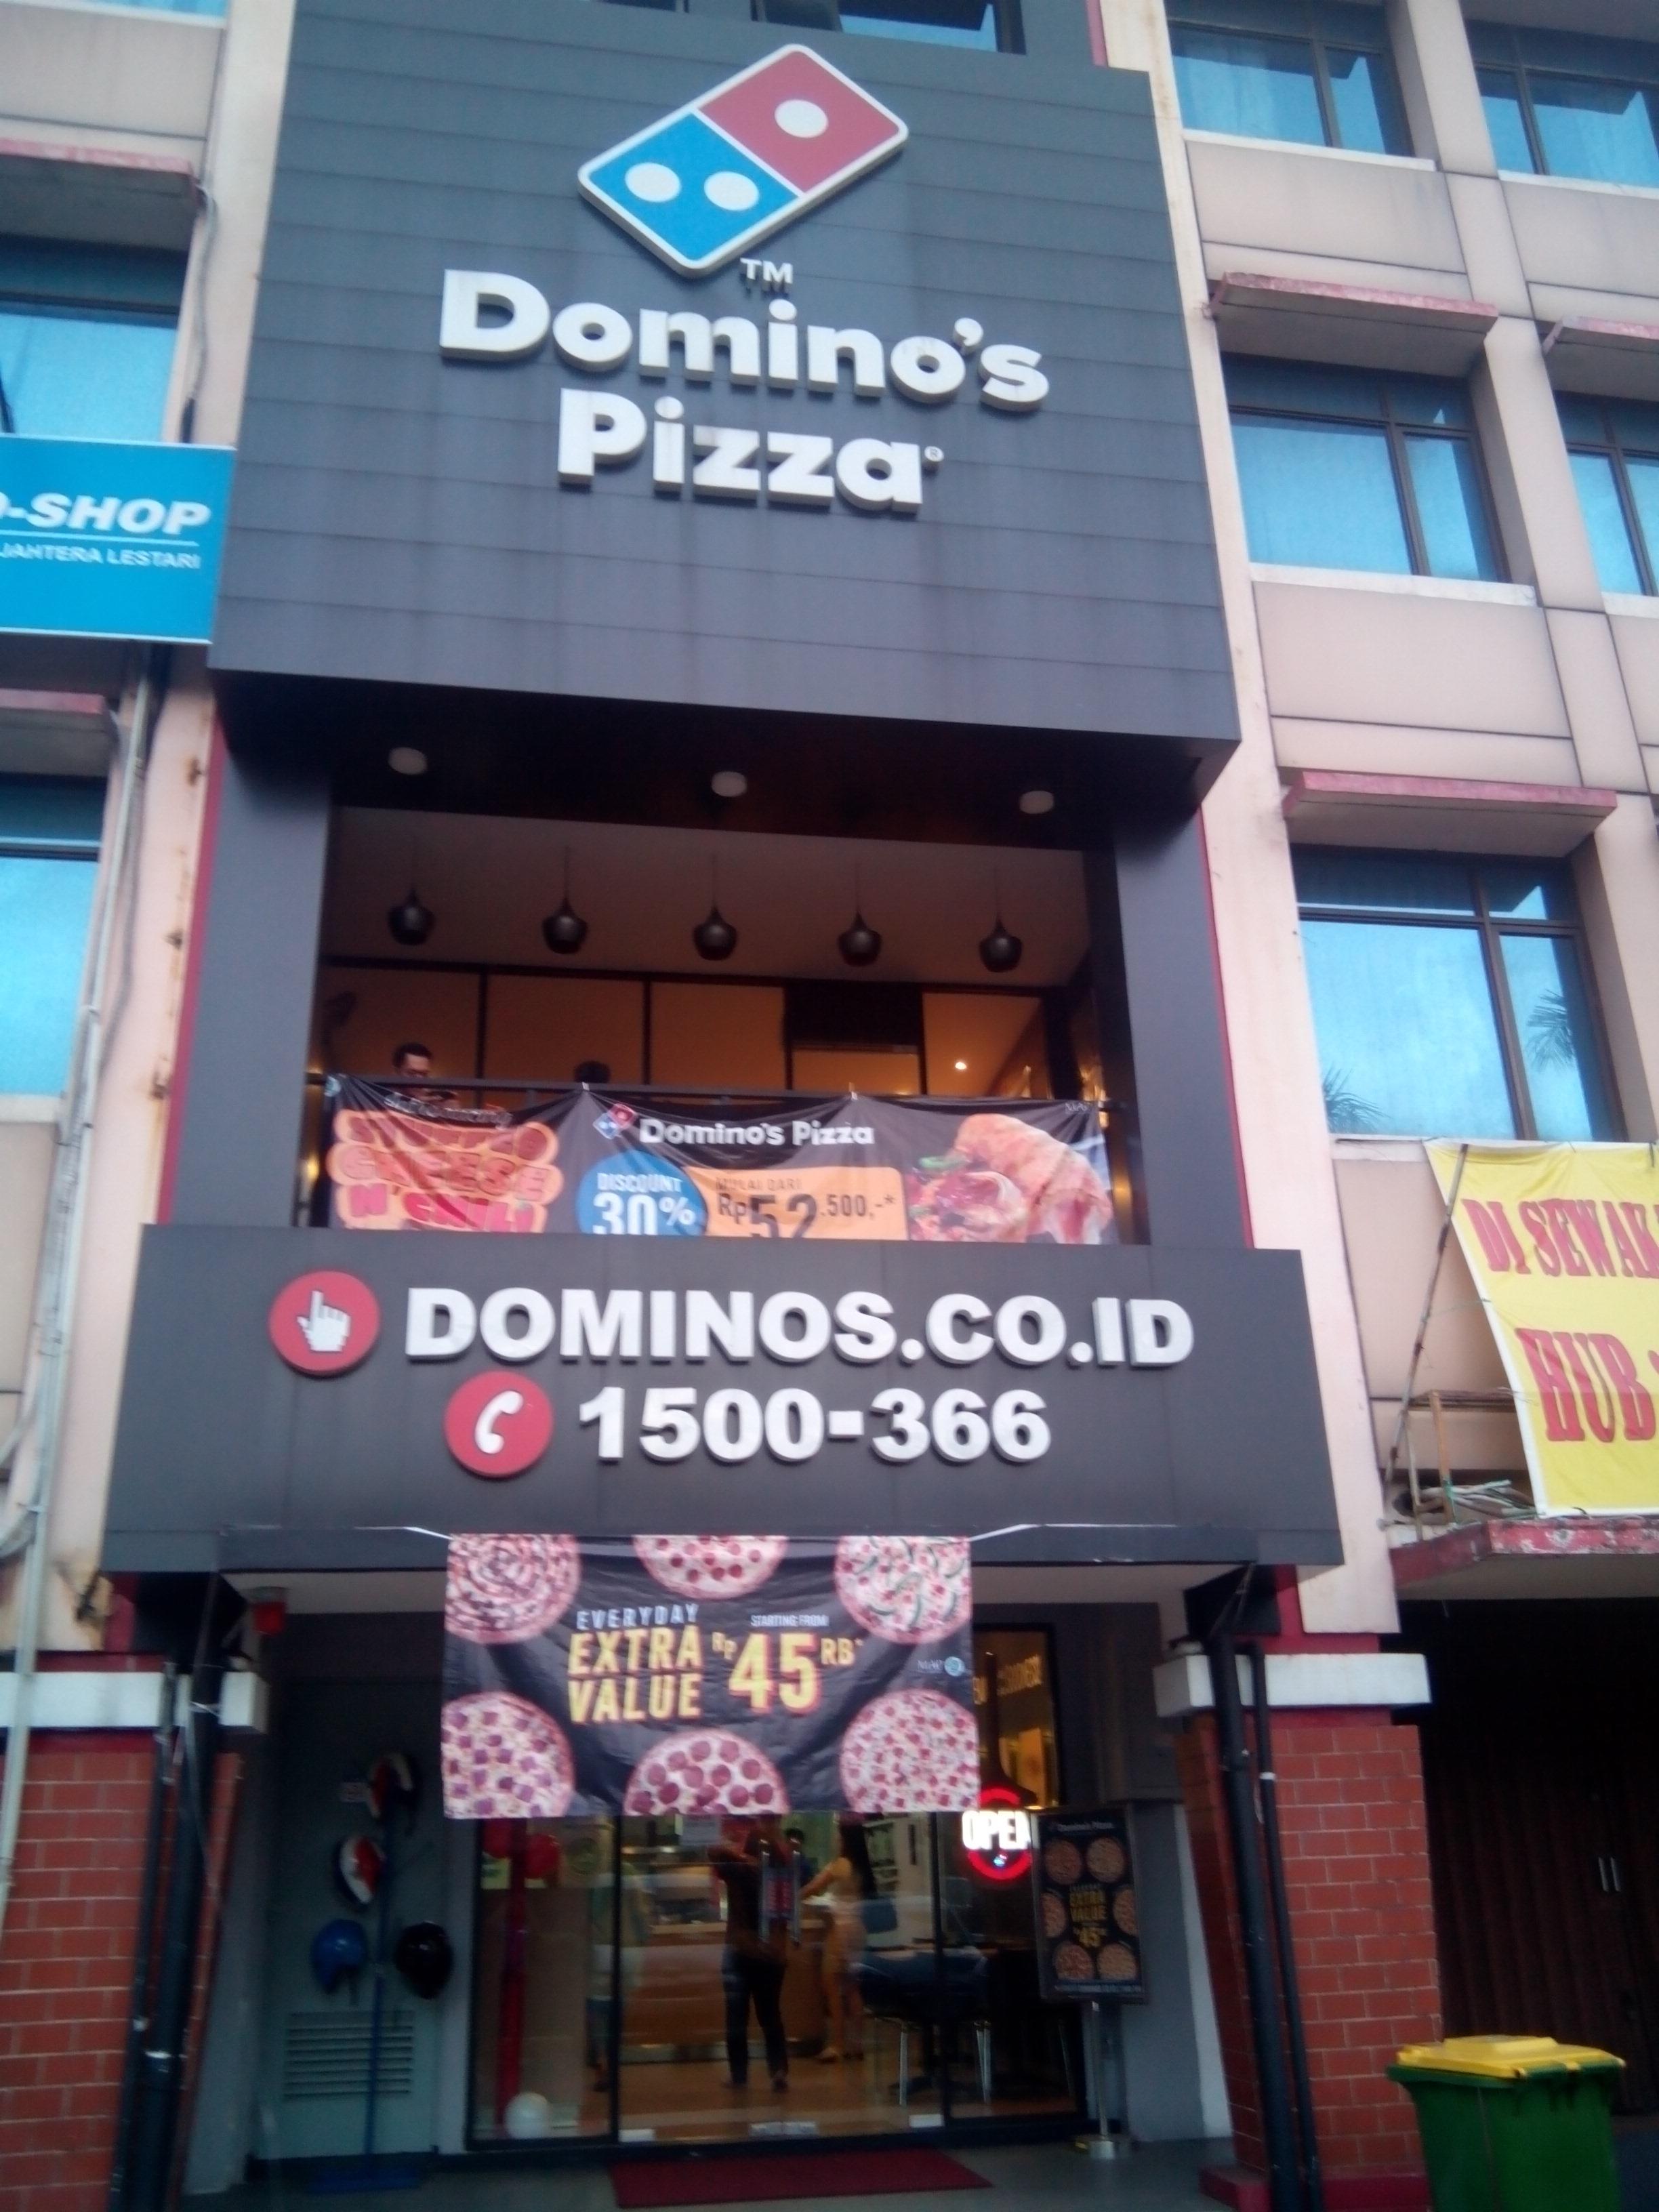 Domino's Pizza - Kec Kelapa Gading Barat, Jakarta Utara